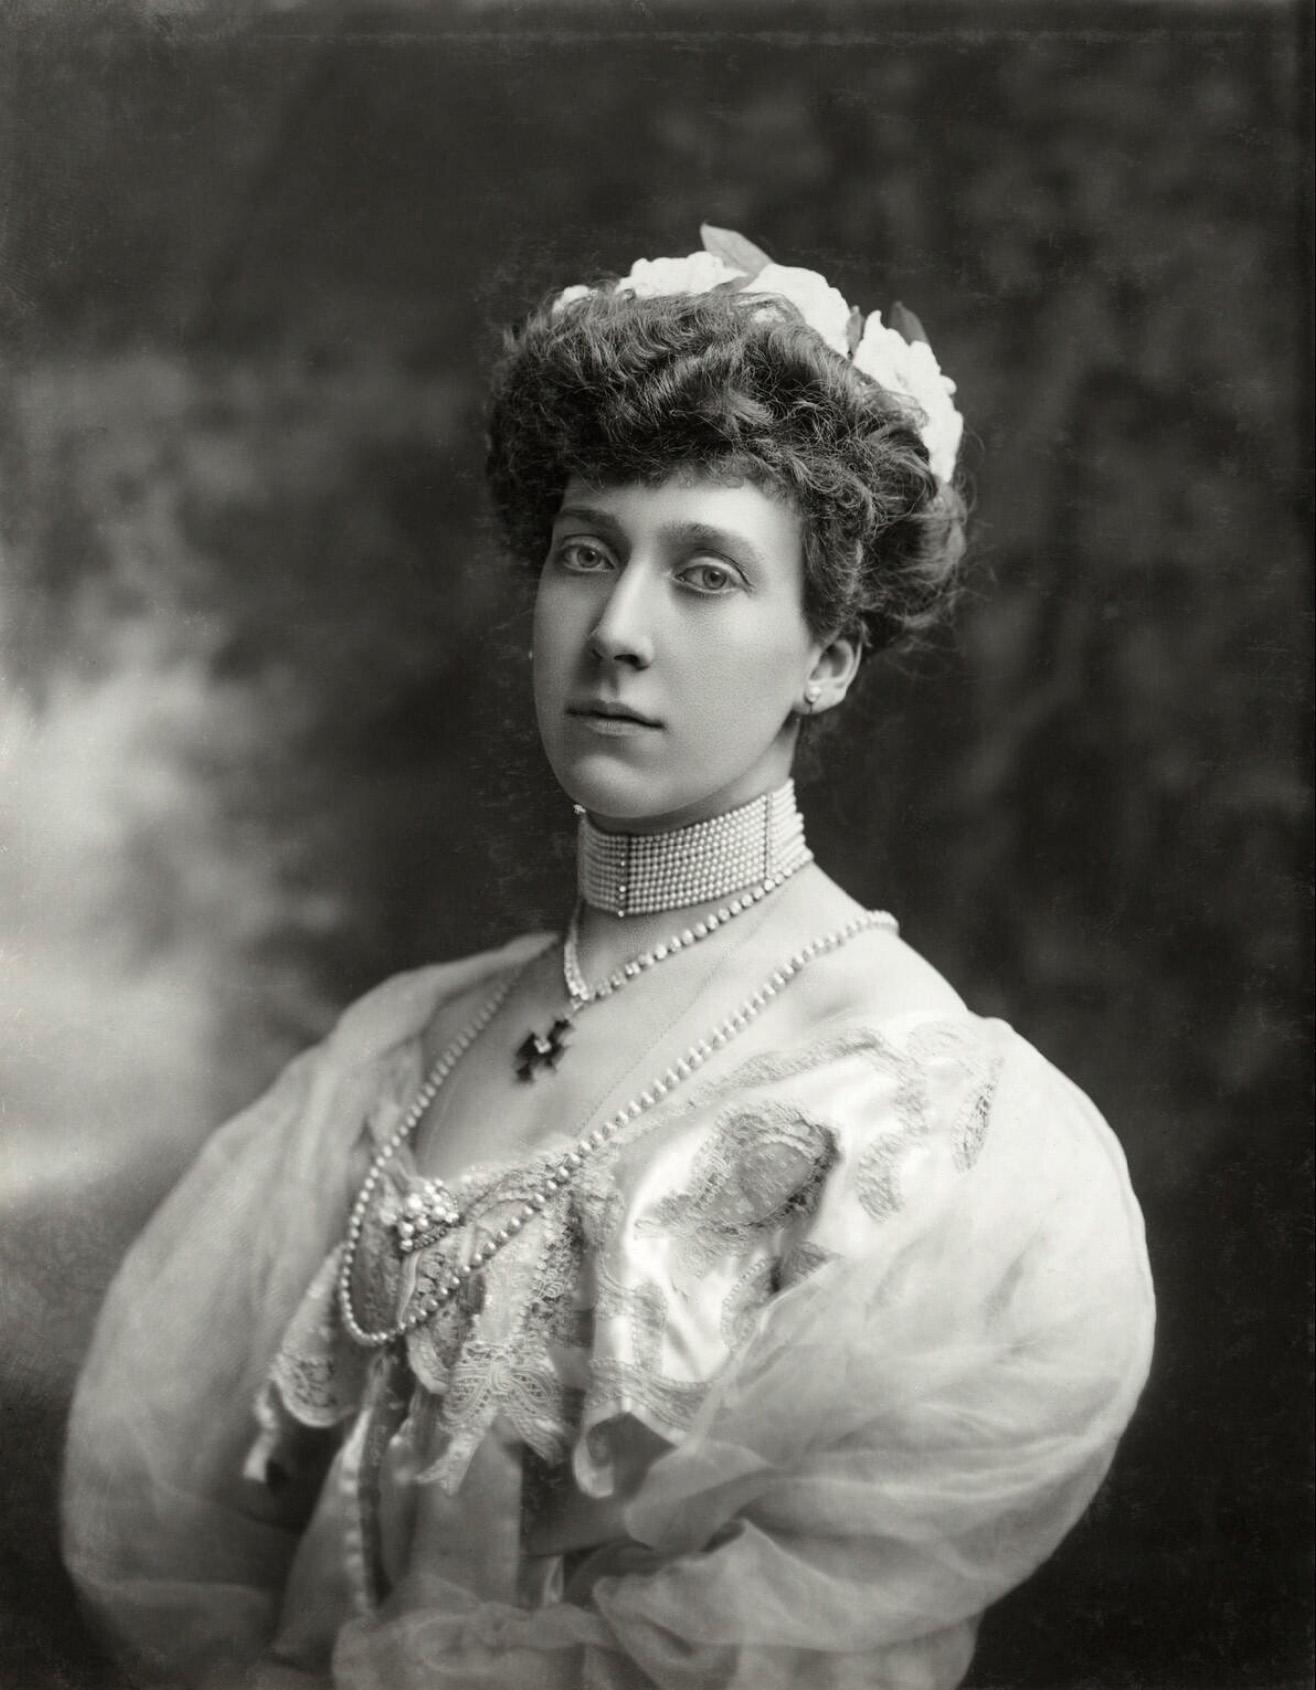 Princess Marie Louise of Schleswig-Holstein